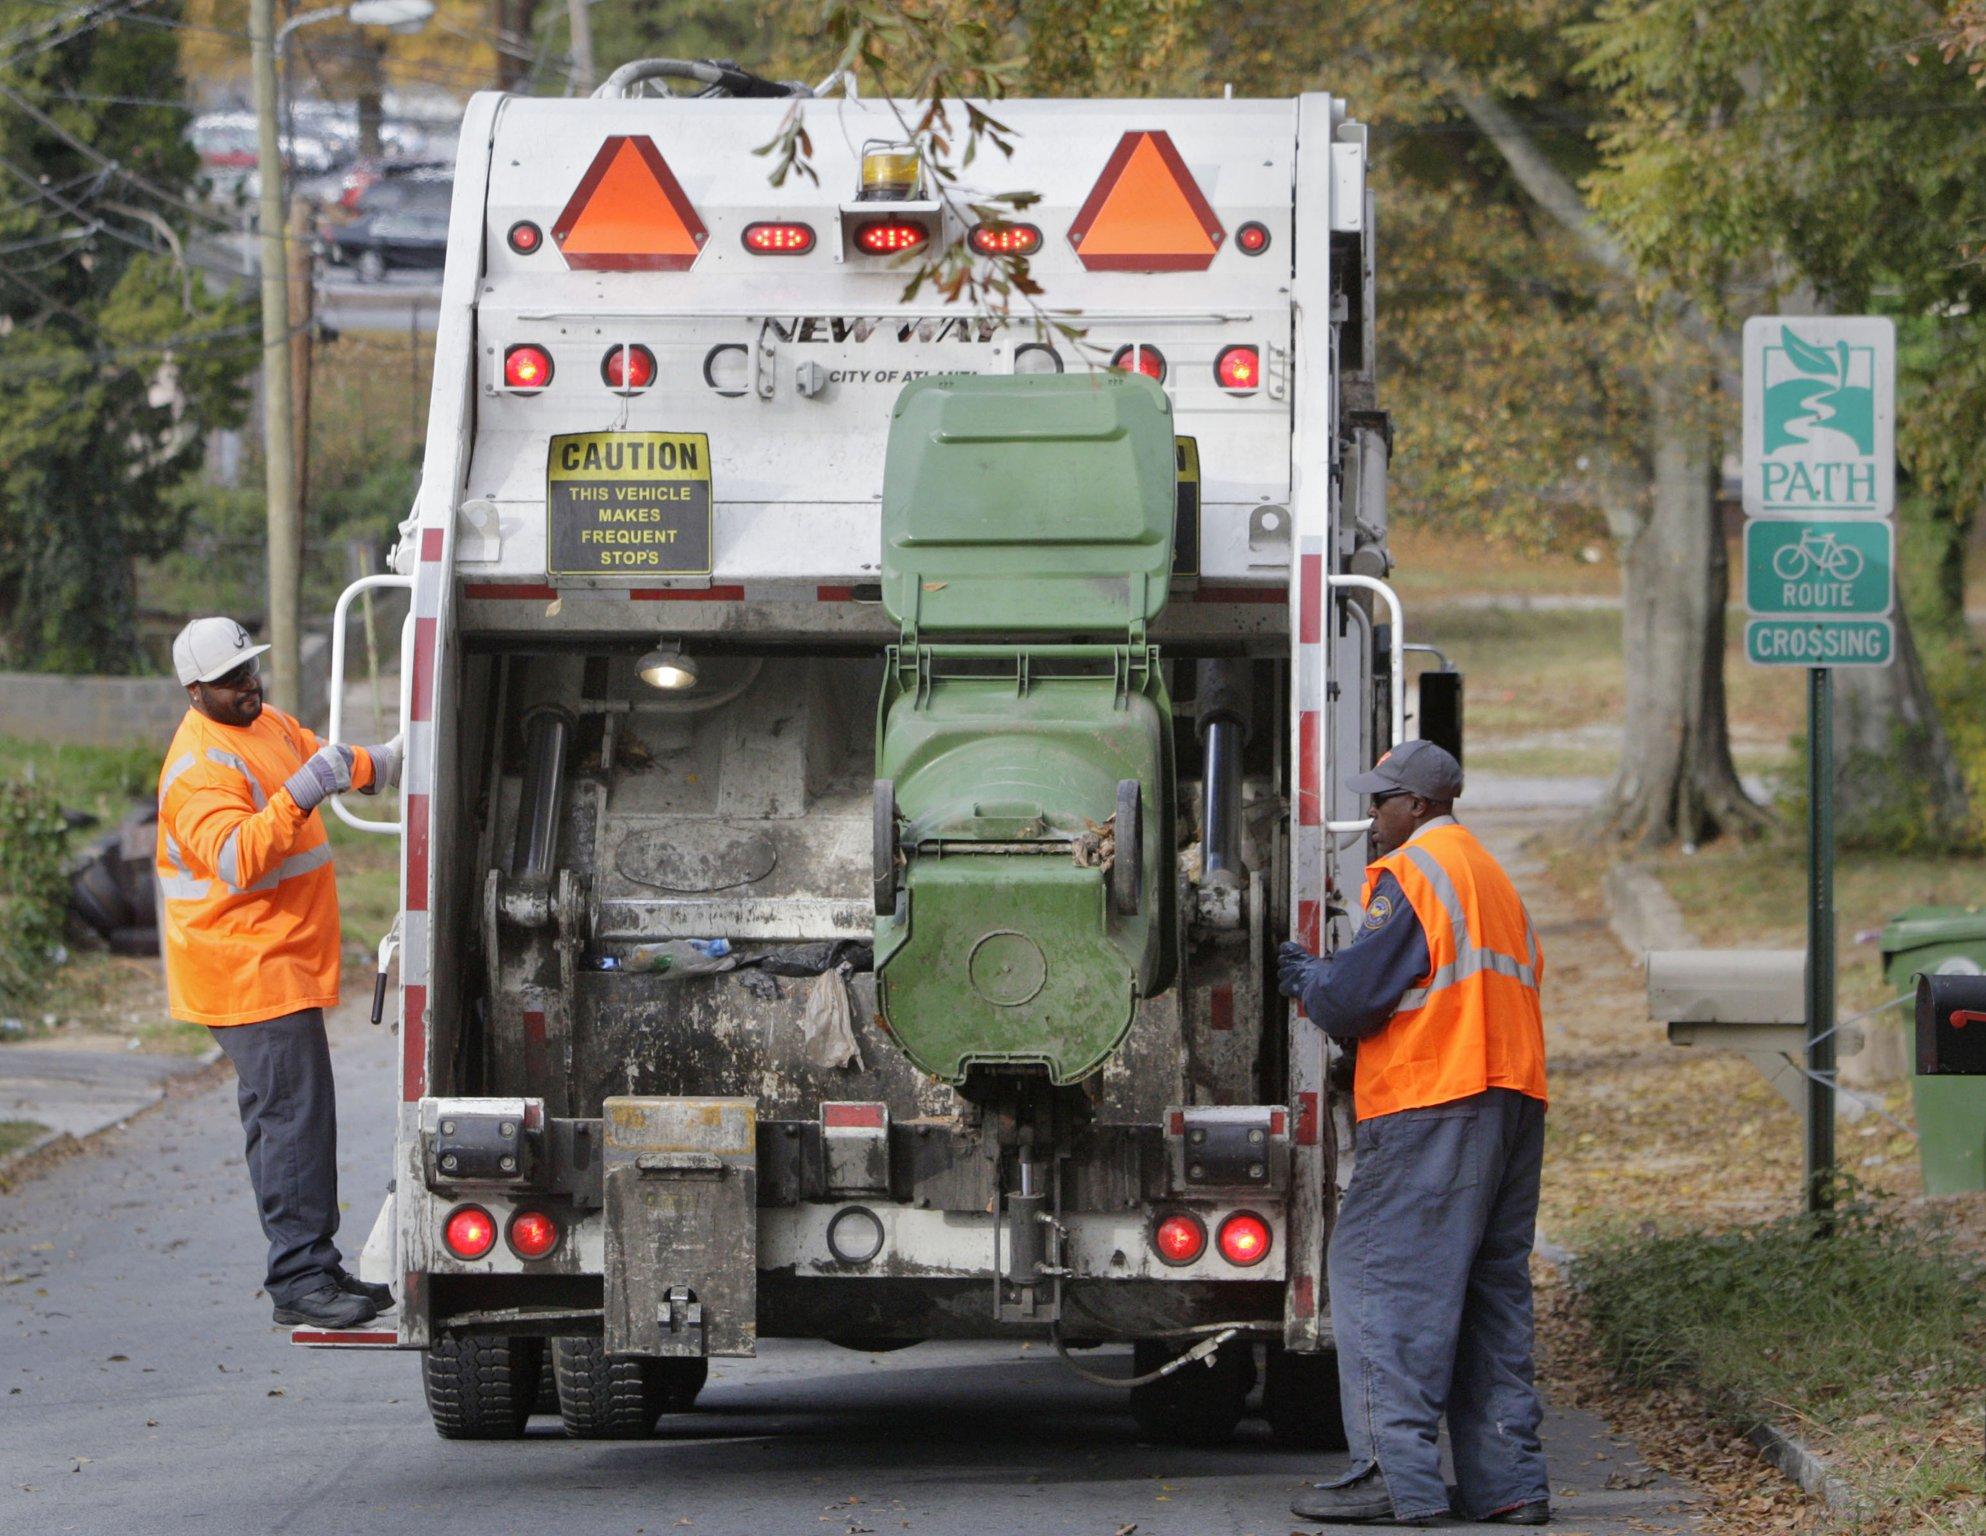 2021 Roswell Garbage Pickup Christmas Weekend Atlanta Trash Pickup Shifts For Christmas New Year S Holidays